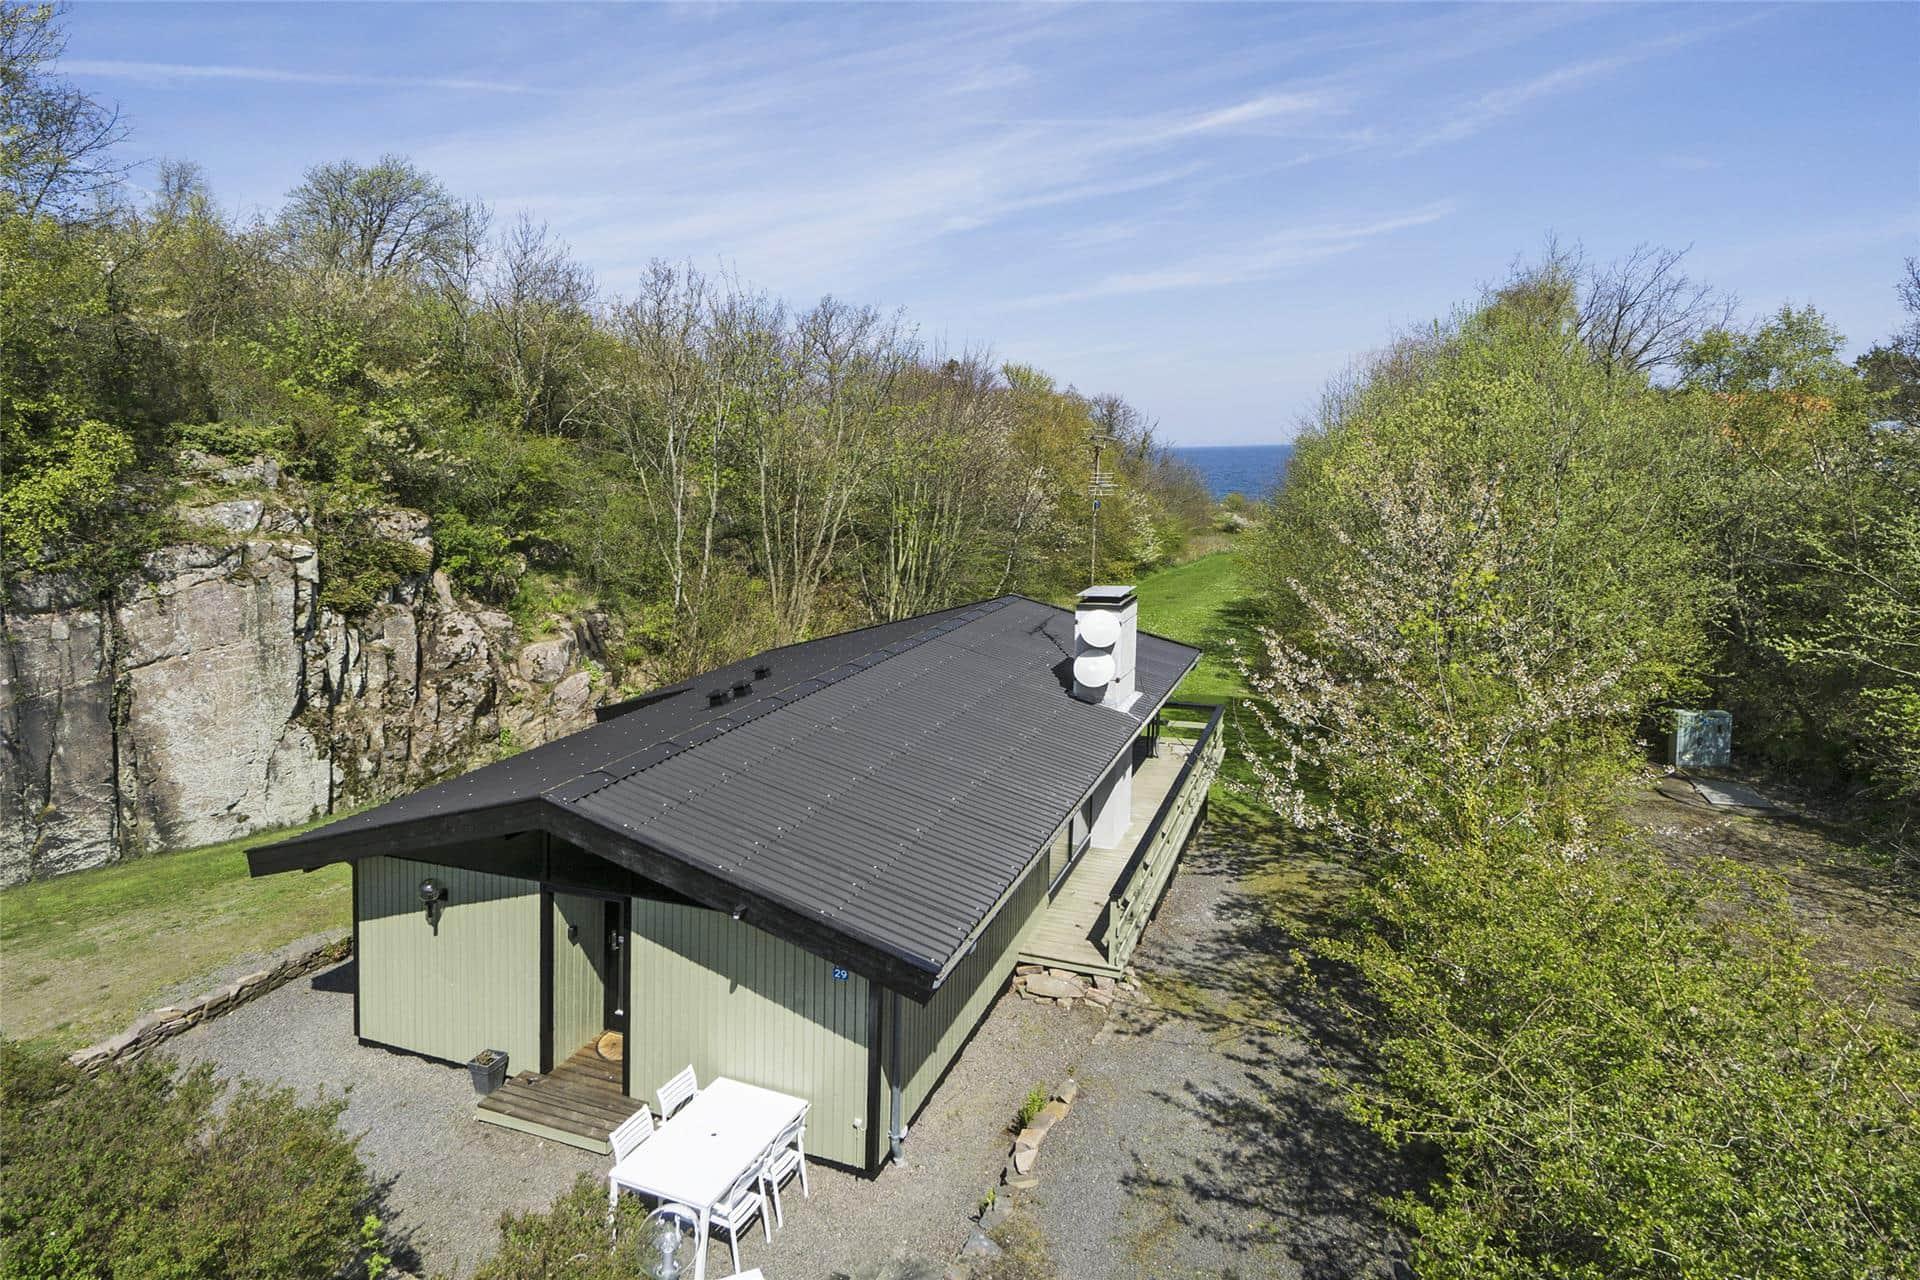 Bild 1-10 Ferienhaus 6780, Grønnedalsvej 29, DK - 3770 Allinge